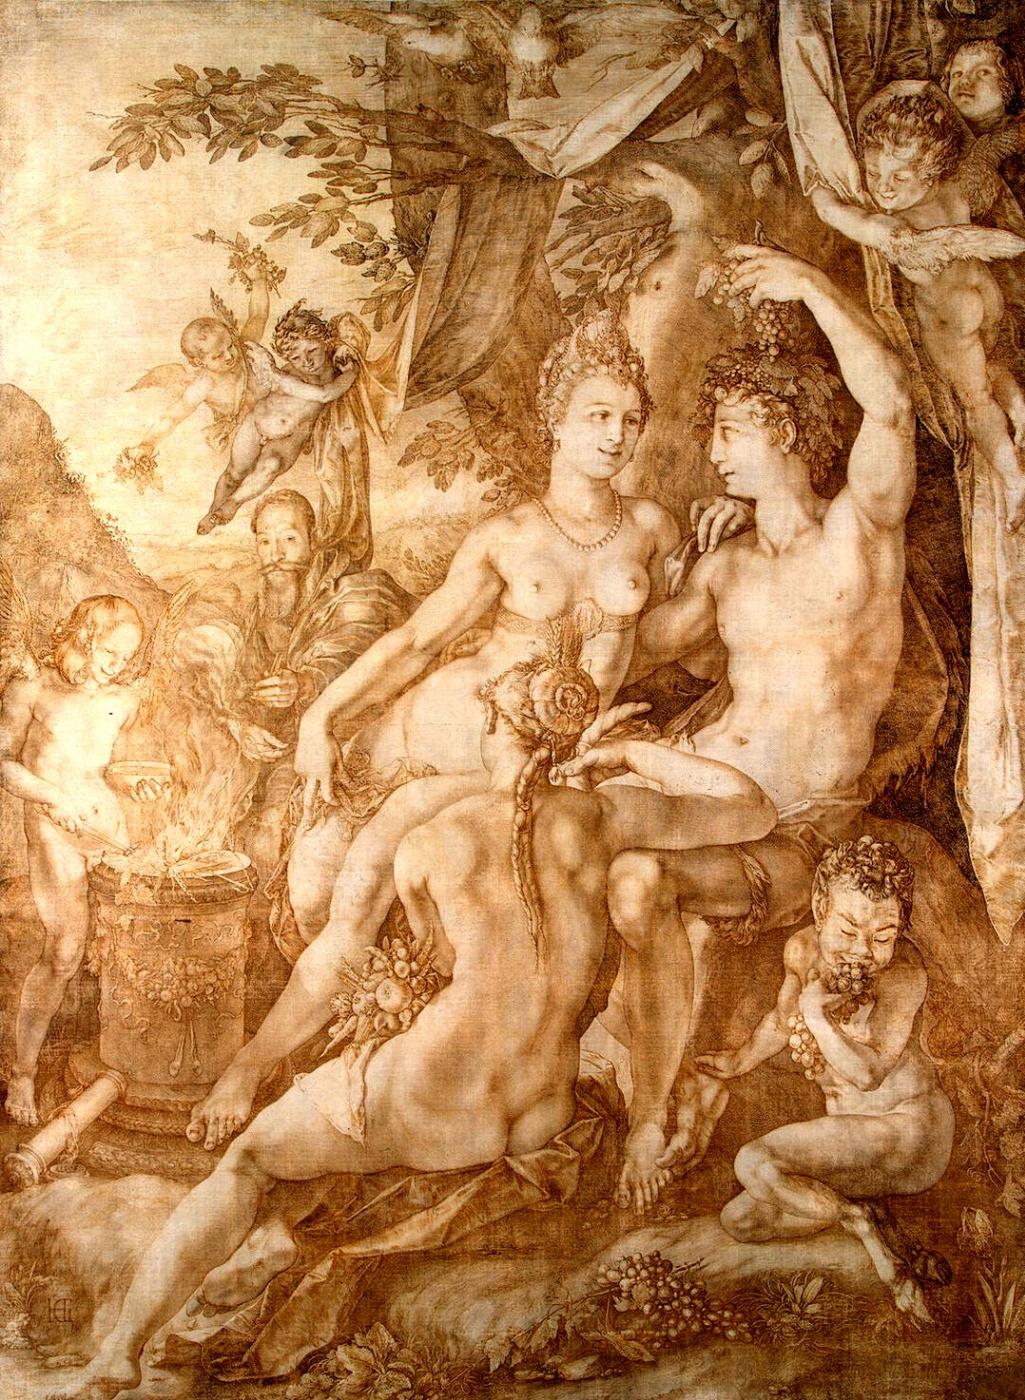 Hendrik_Goltzius_-_Bacchus_Venus_and_Ceres_c1606_(pen_and_brown_ink)